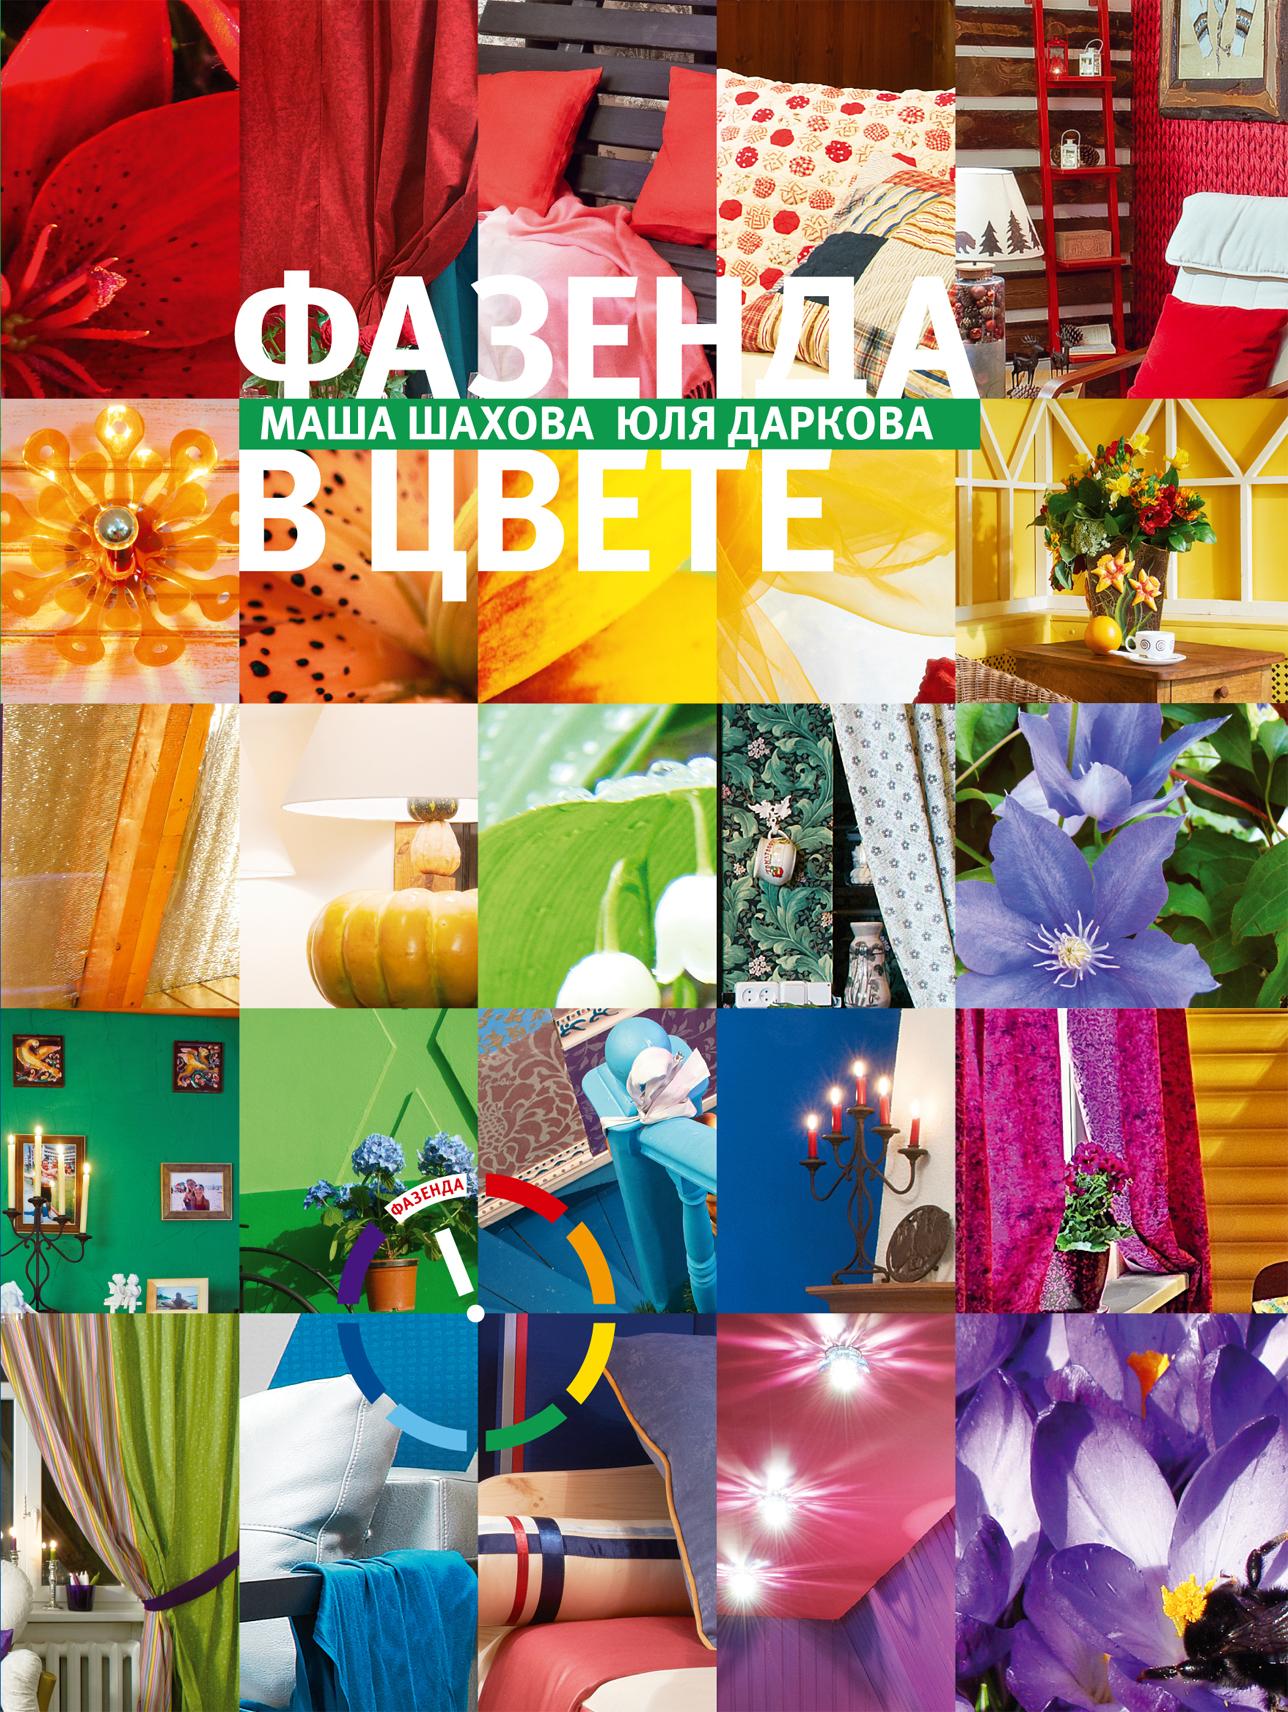 Шахова М., Даркова Ю. Фазенда 3. Фазенда в цвете шахова м даркова ю коллекция фазенды